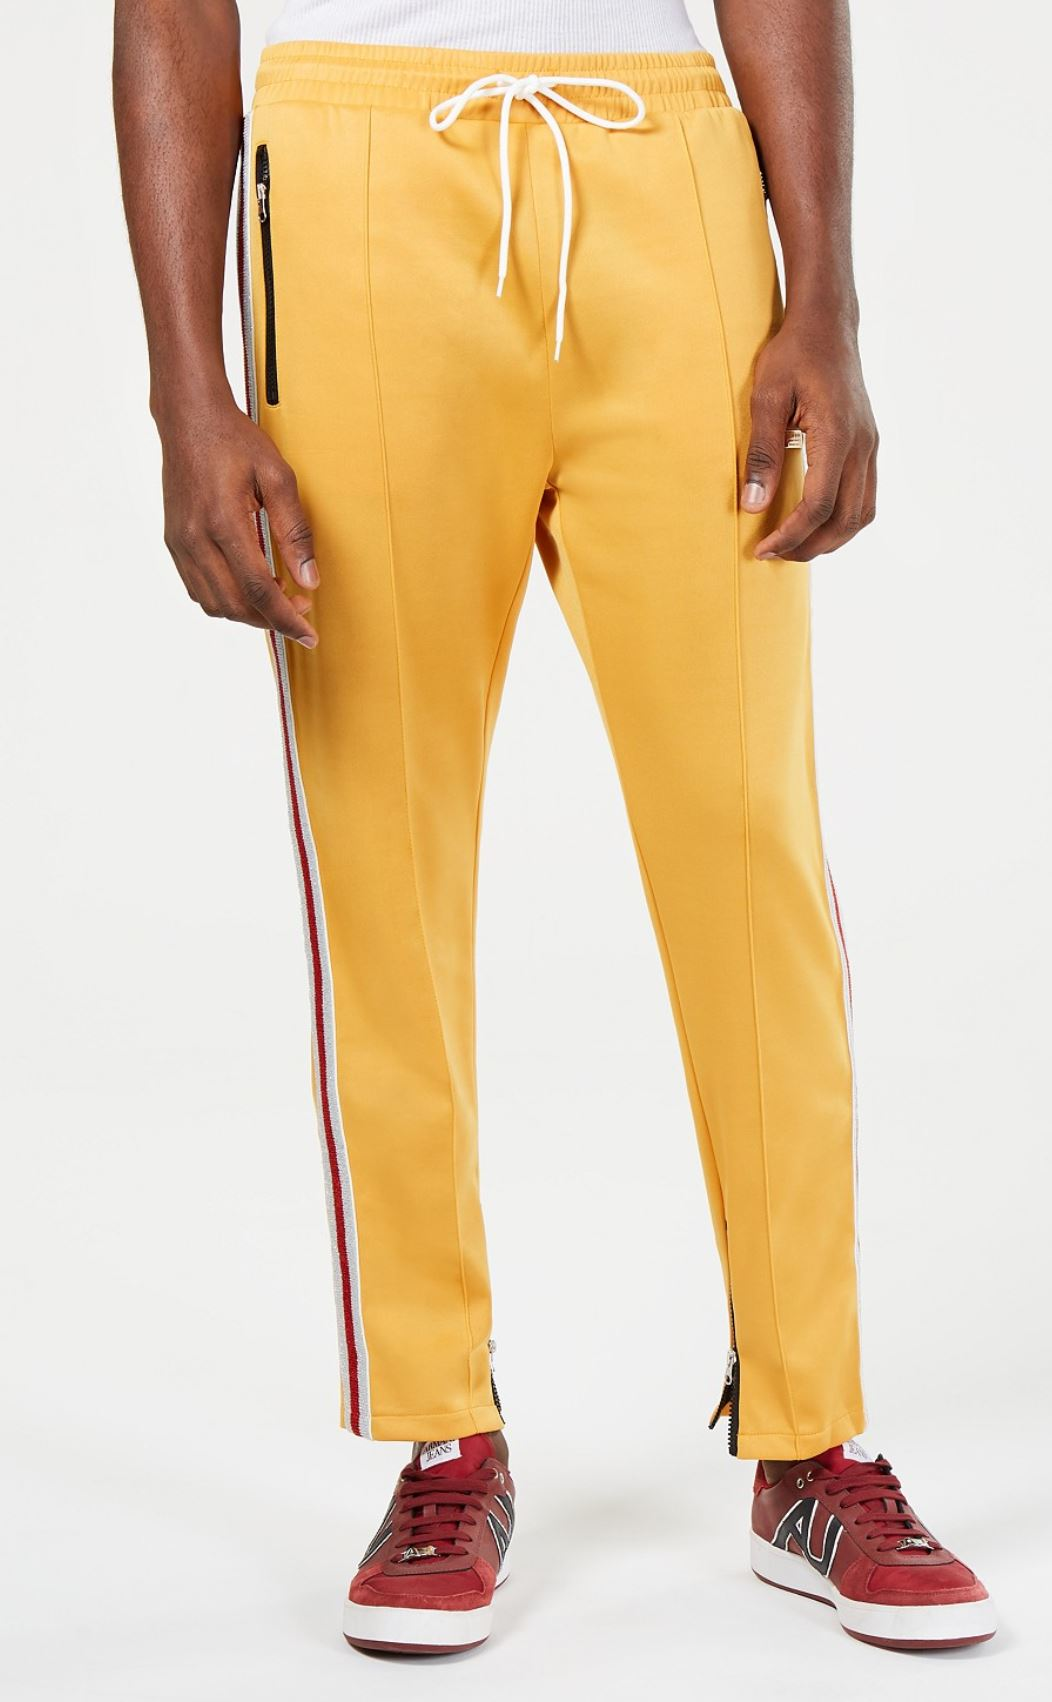 Golden Track Pants from macys.com